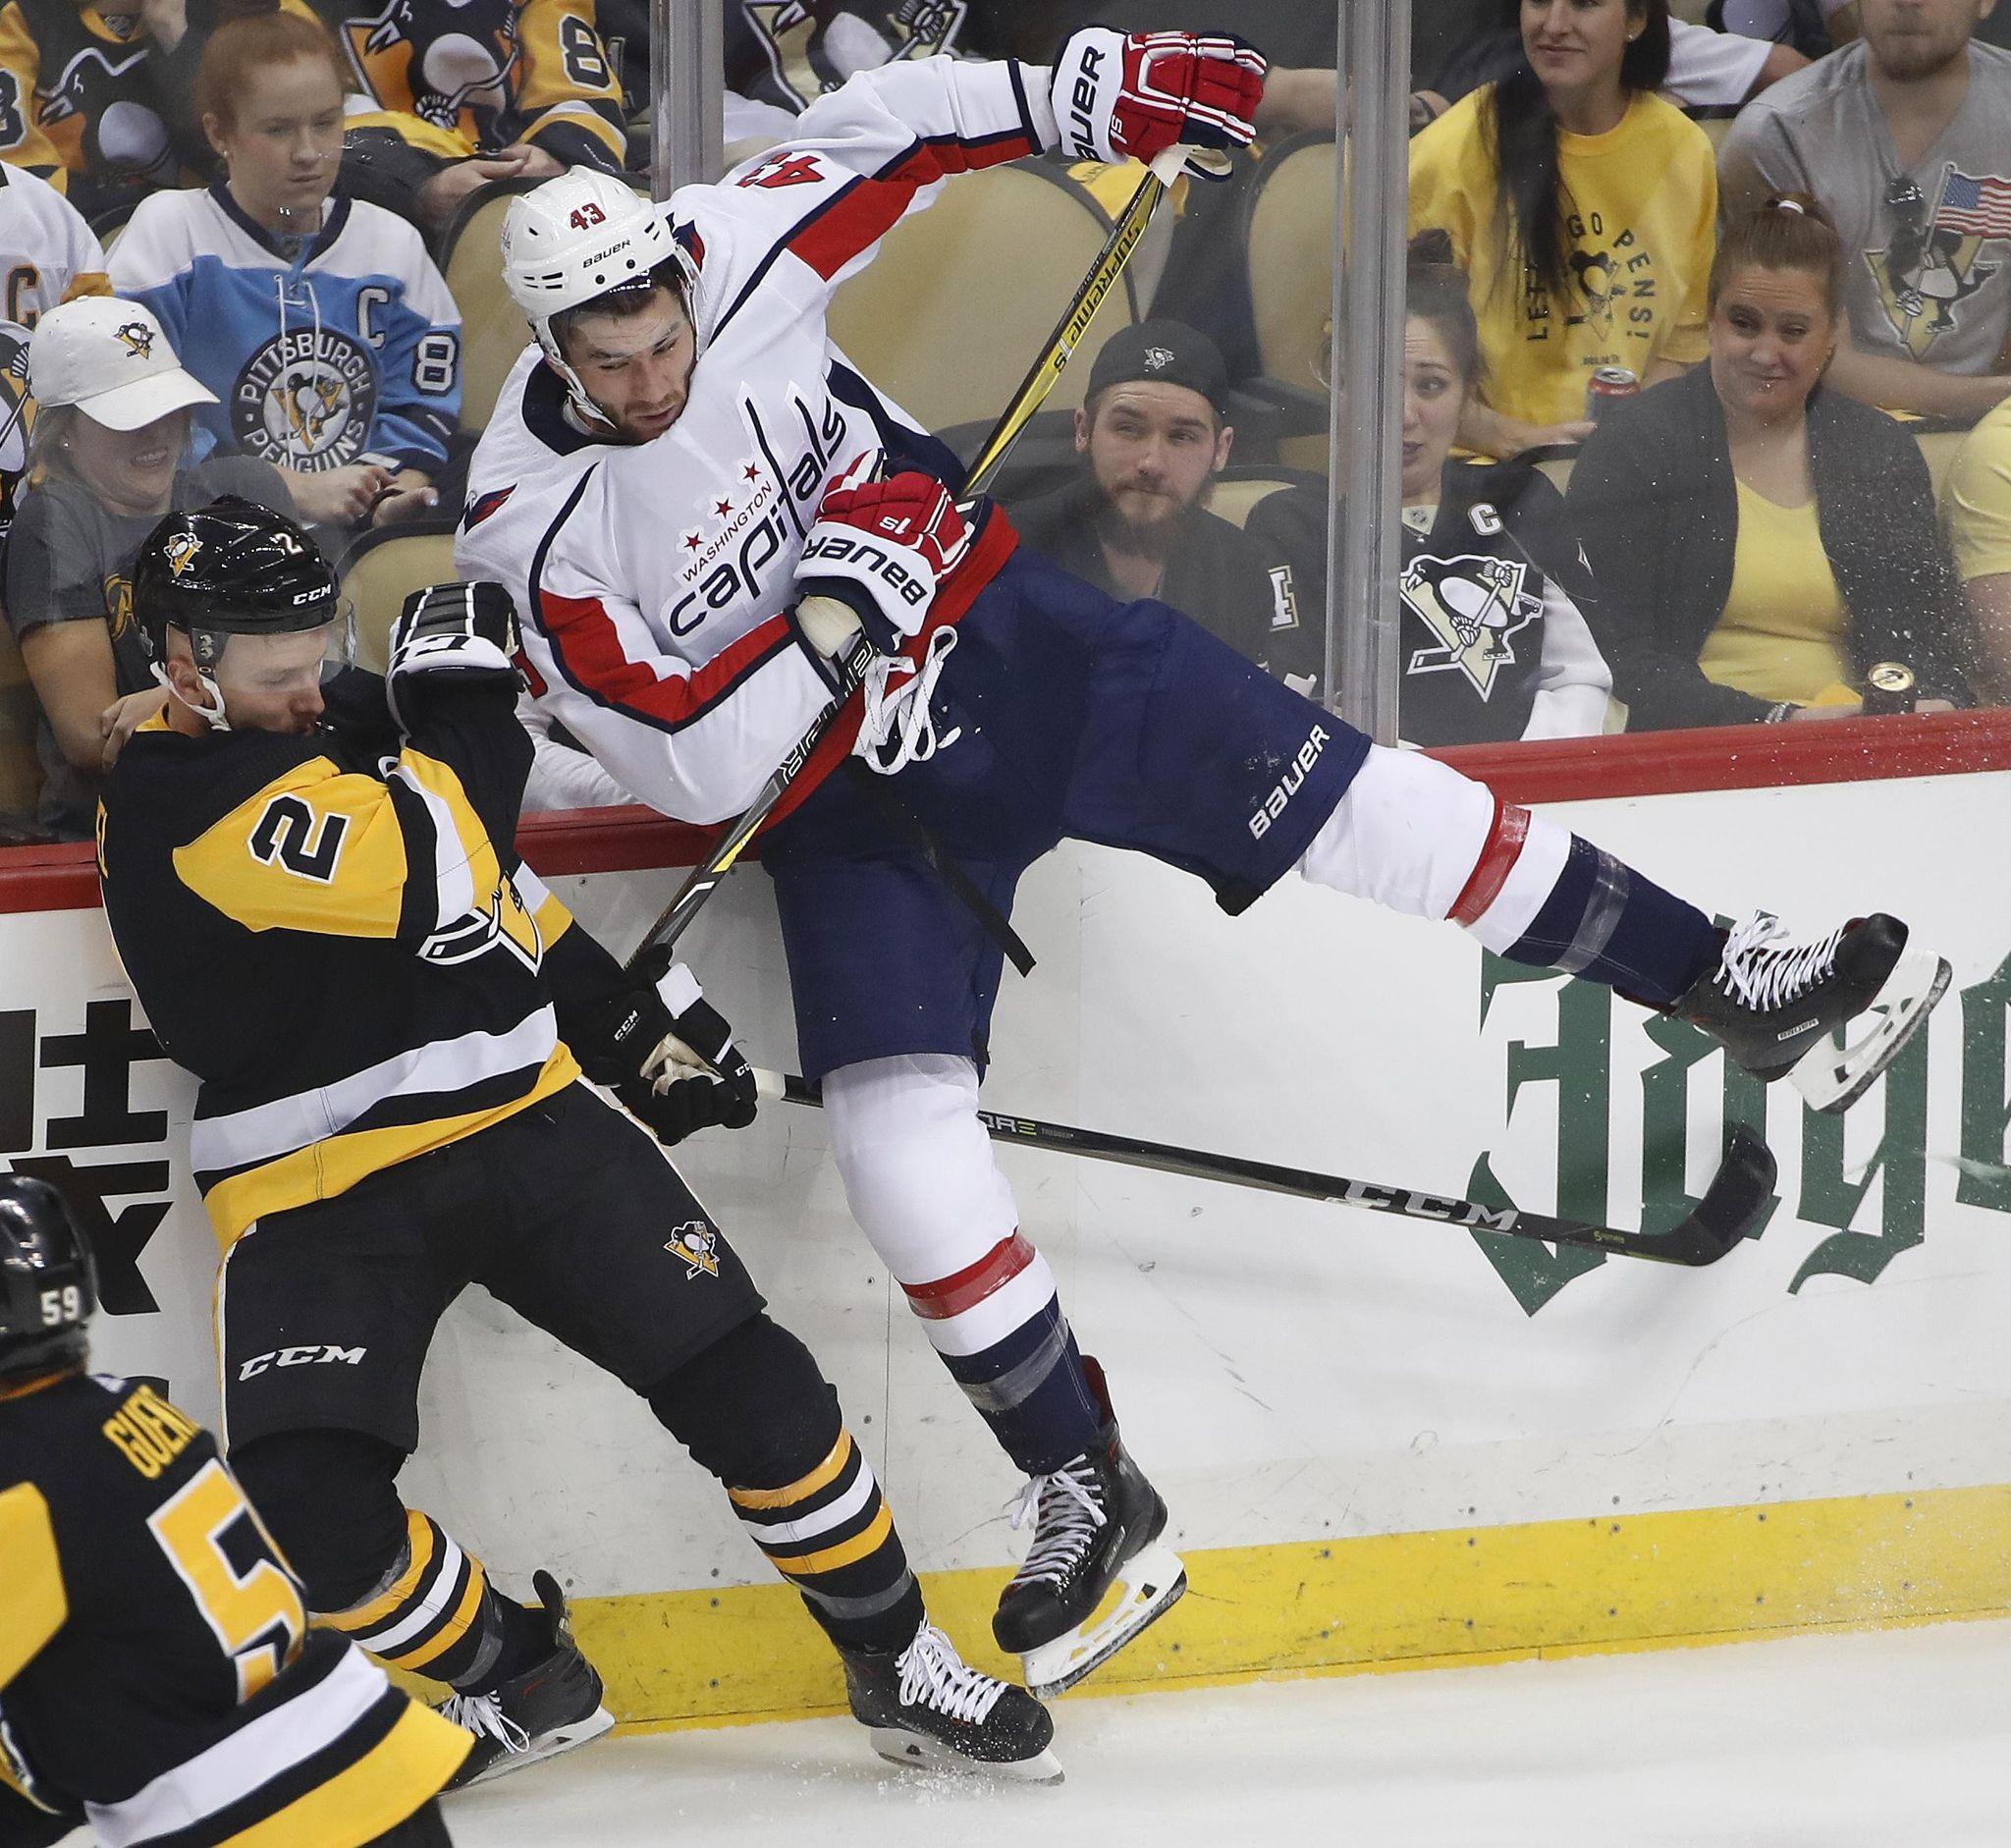 Capitals_penguins_hockey_93718_s2048x1882